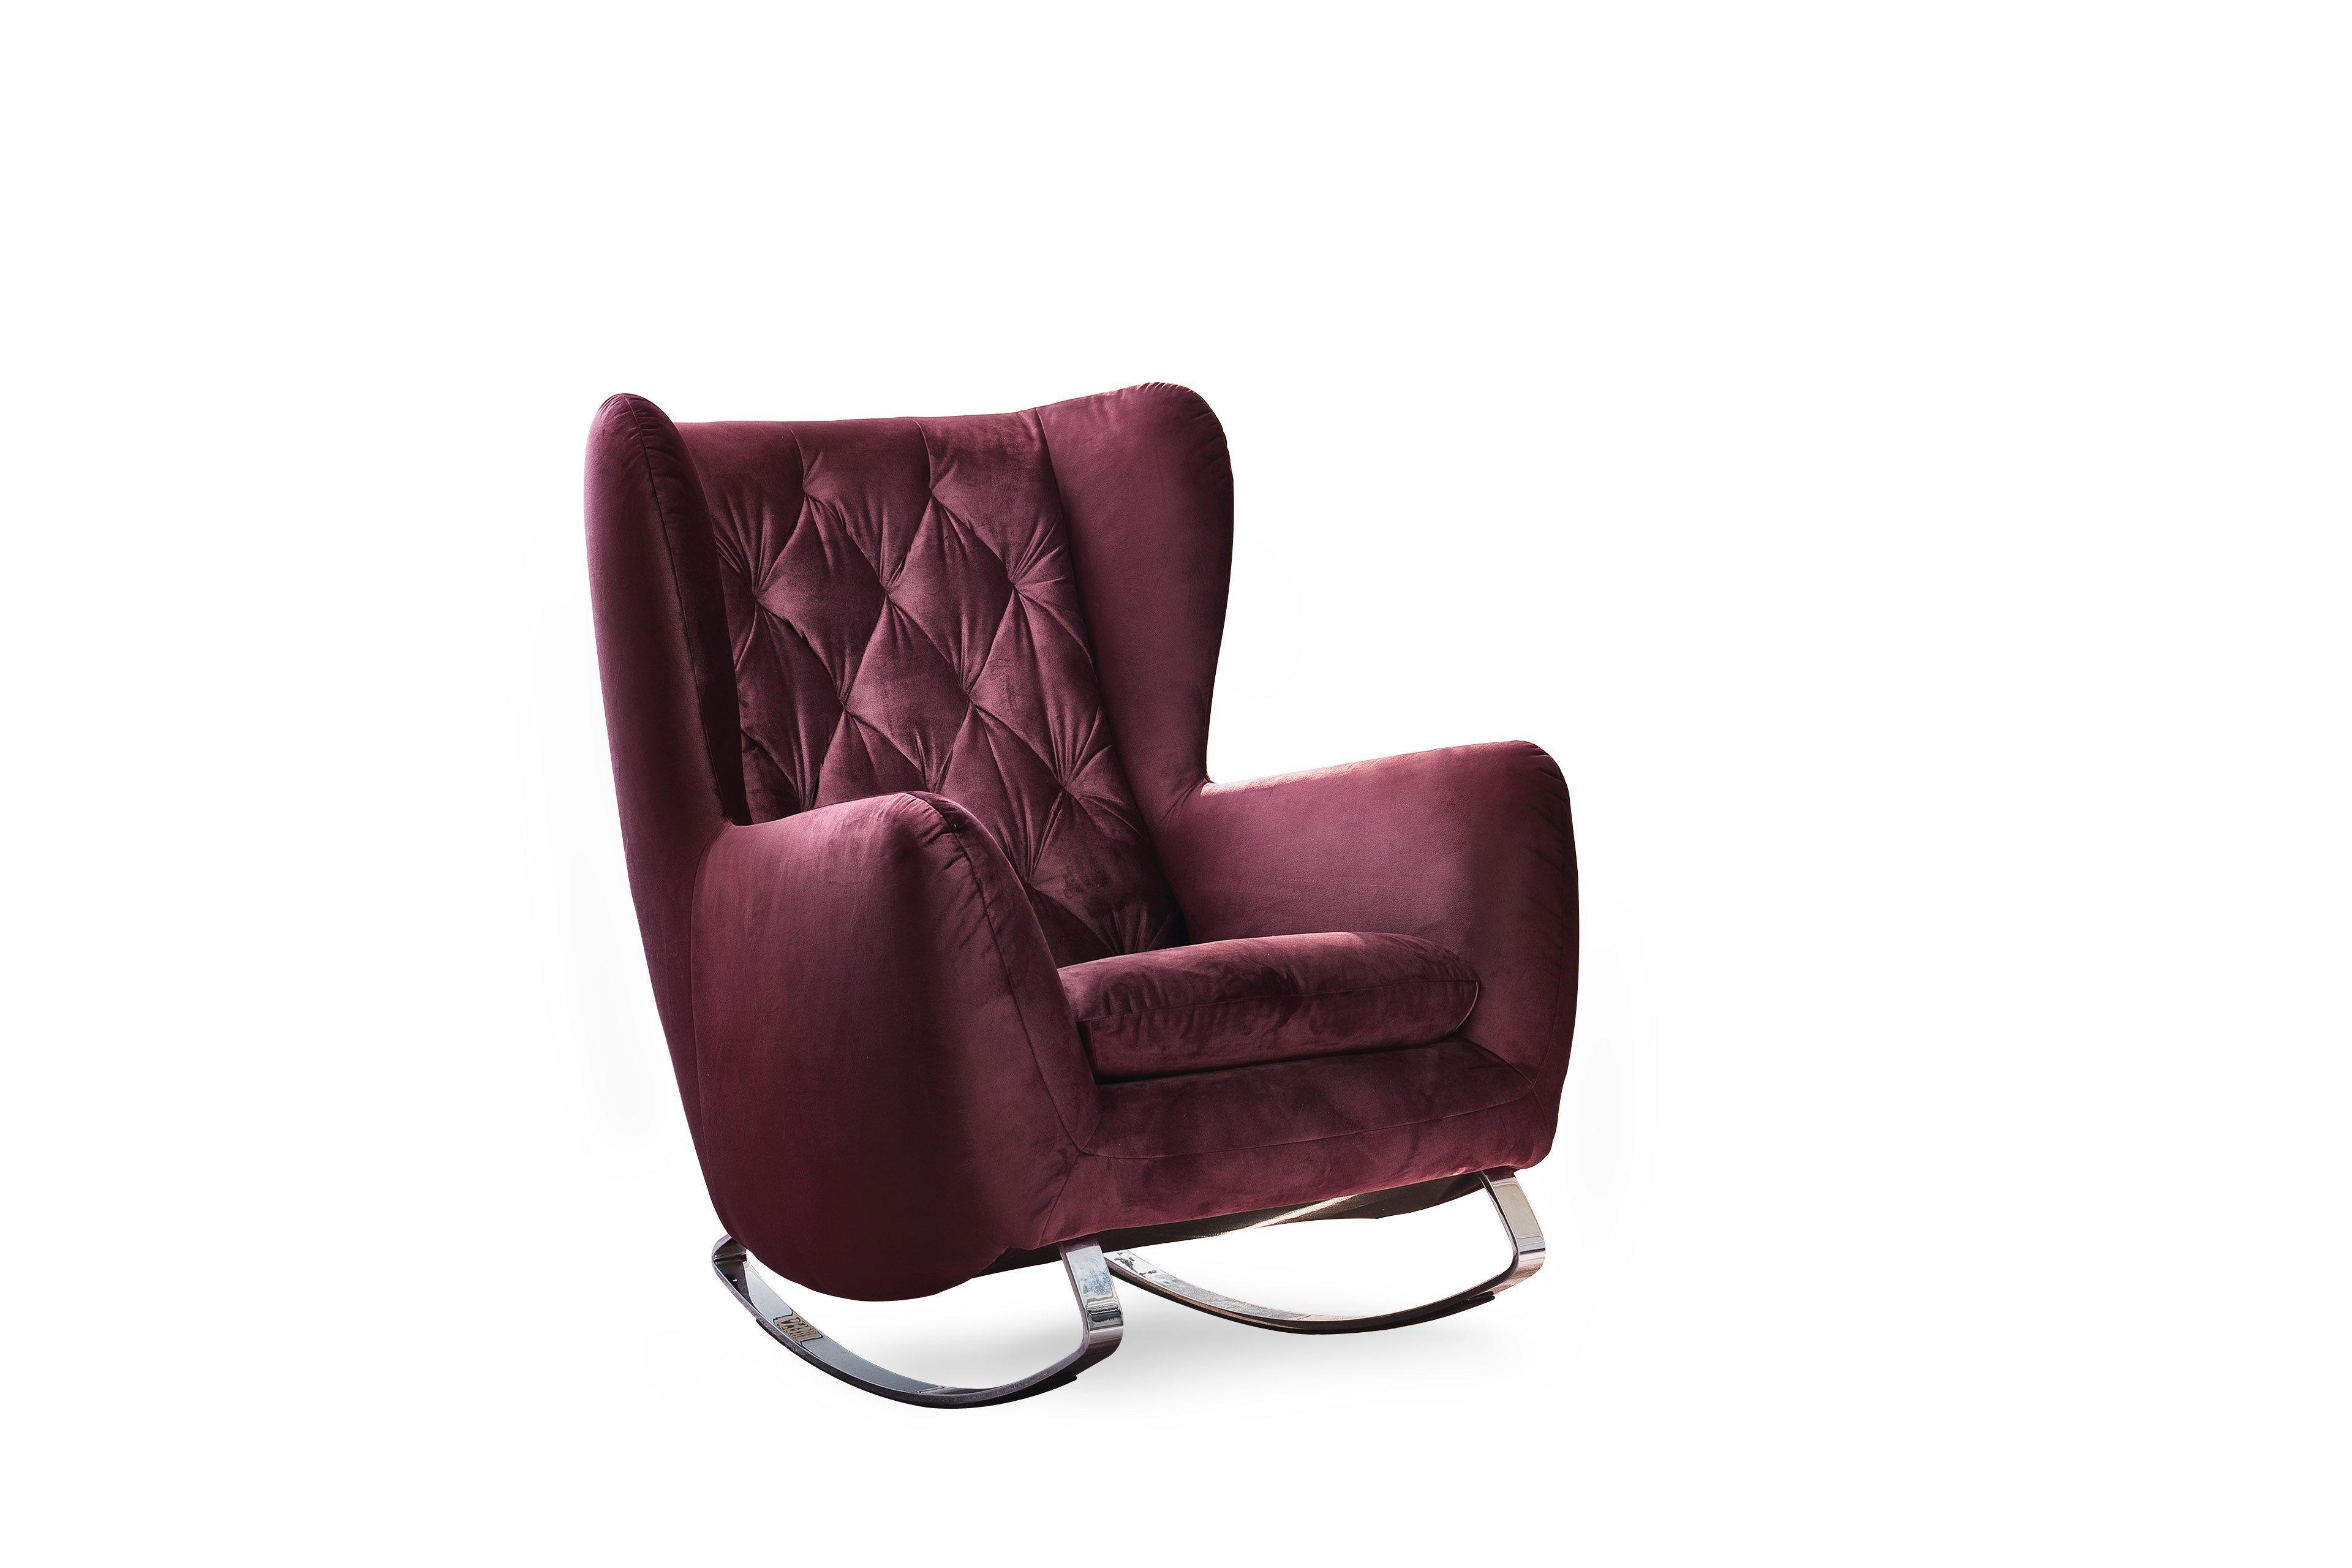 candy polsterm bel sixty scranton schaukelsessel purple m bel letz ihr online shop. Black Bedroom Furniture Sets. Home Design Ideas